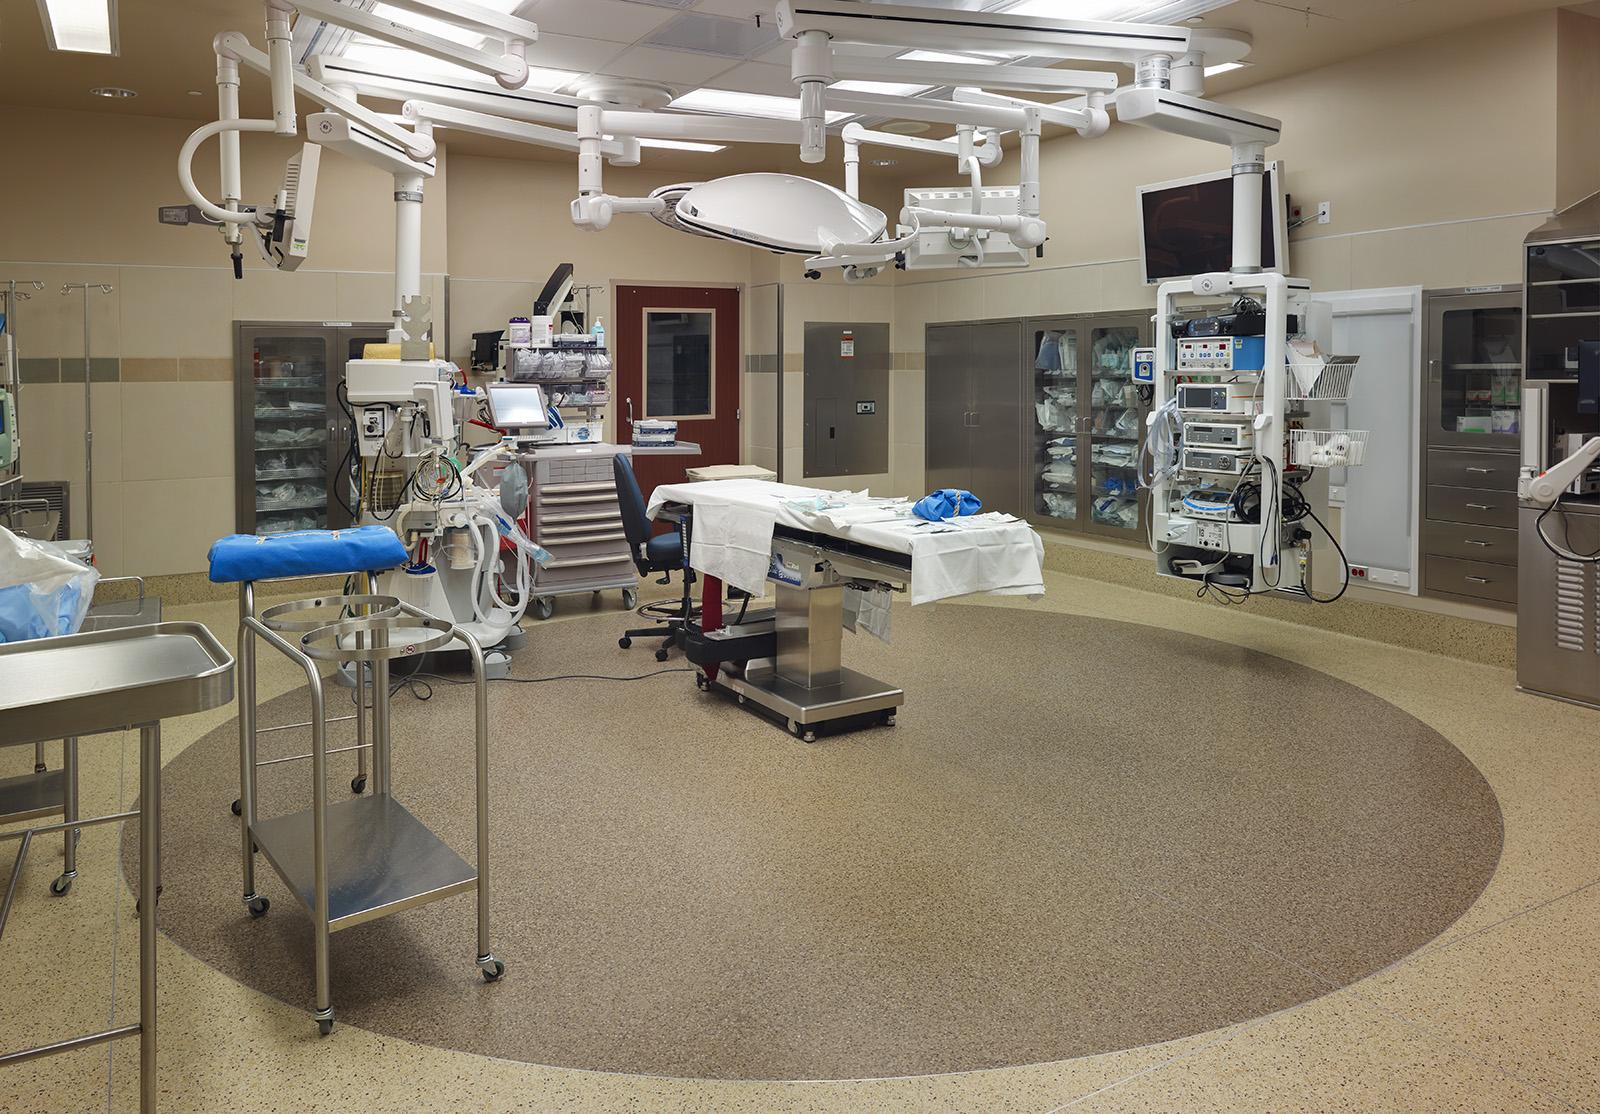 oakwood-heritage-hospital-surgery